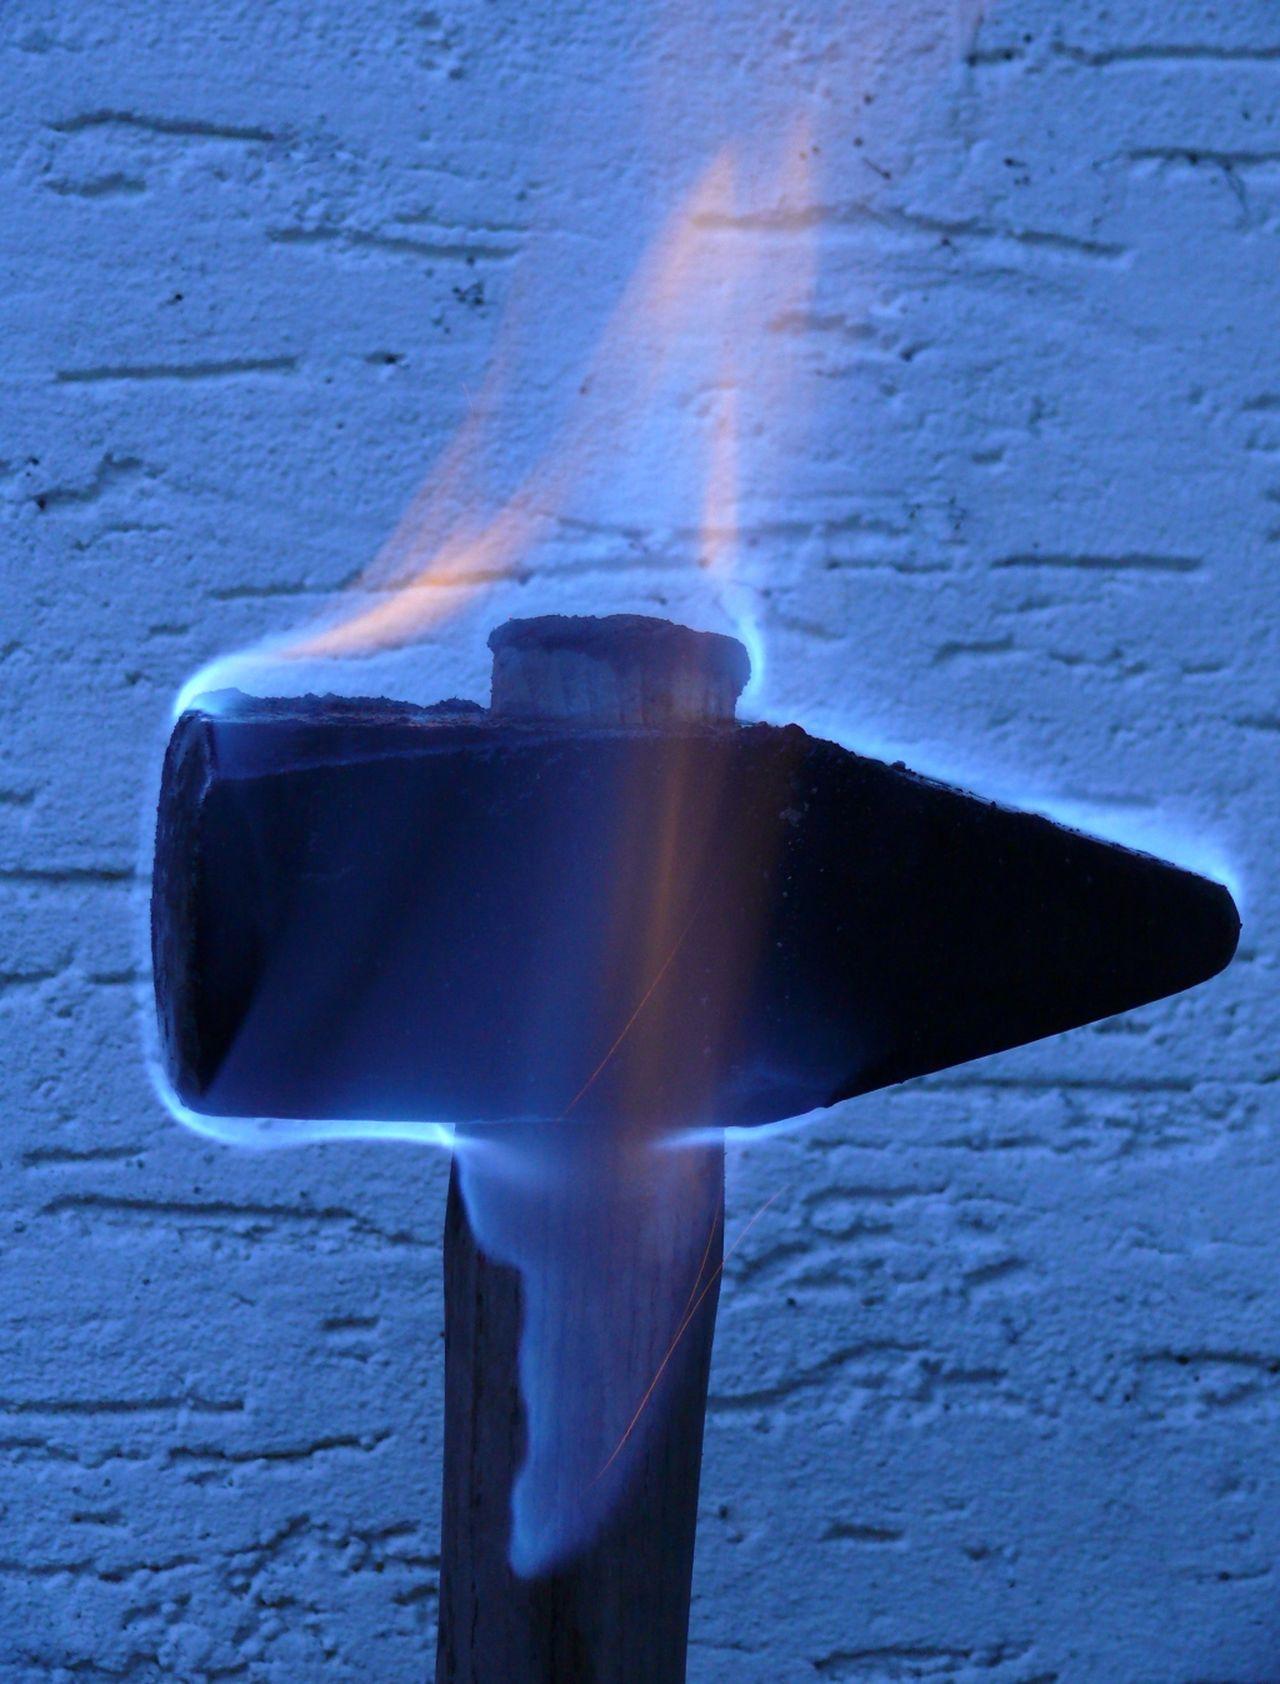 Blue Burning Close-up Germanische Mythologie Hammer Kriegshammer Metal Mjolnir Motion No People Outdoors Single Object Thor